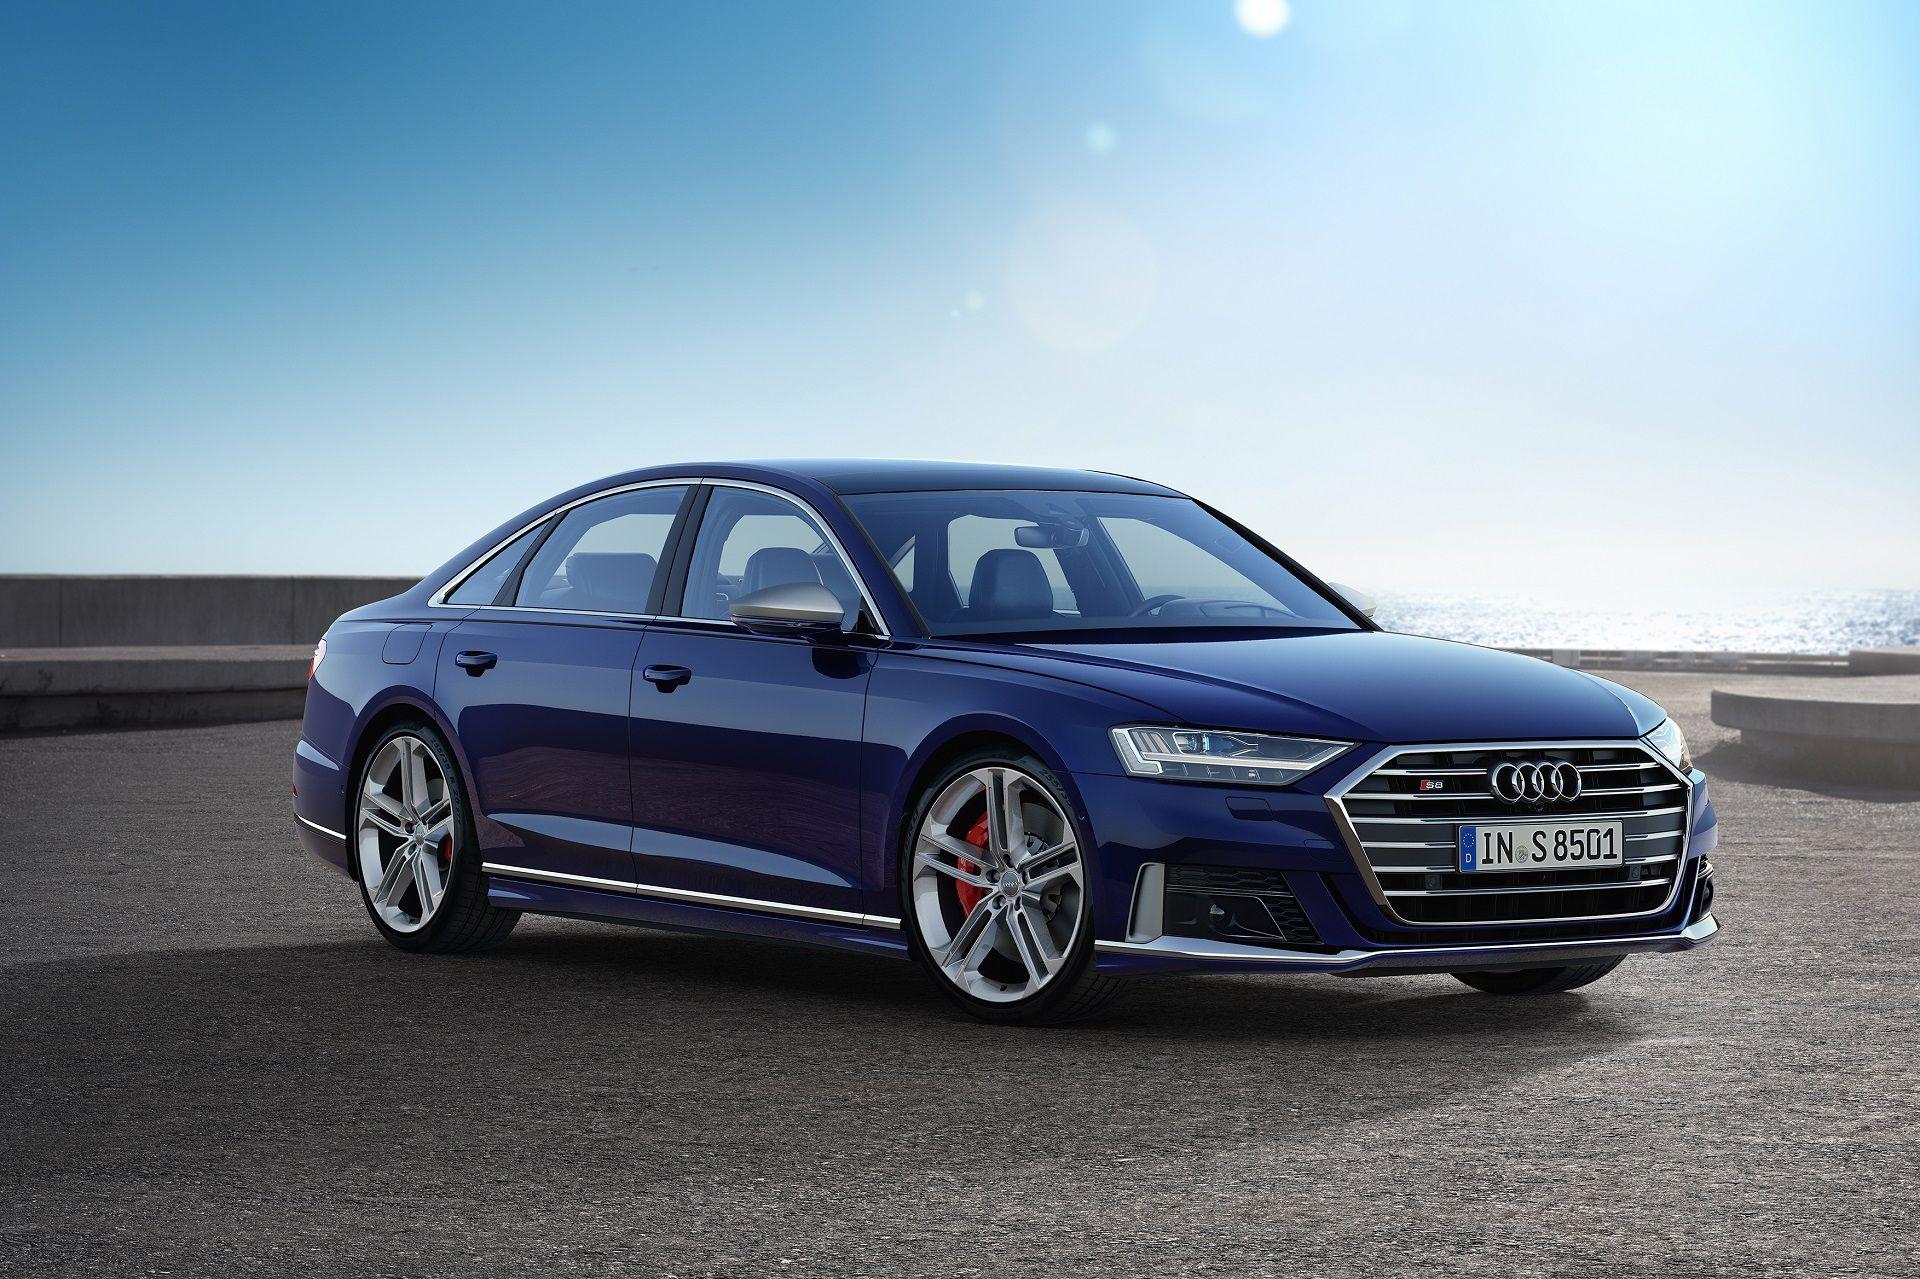 2020 Audi S8 Is Here To Take On The Bmw M760li Xdrive Audi A8 Bmw Audi